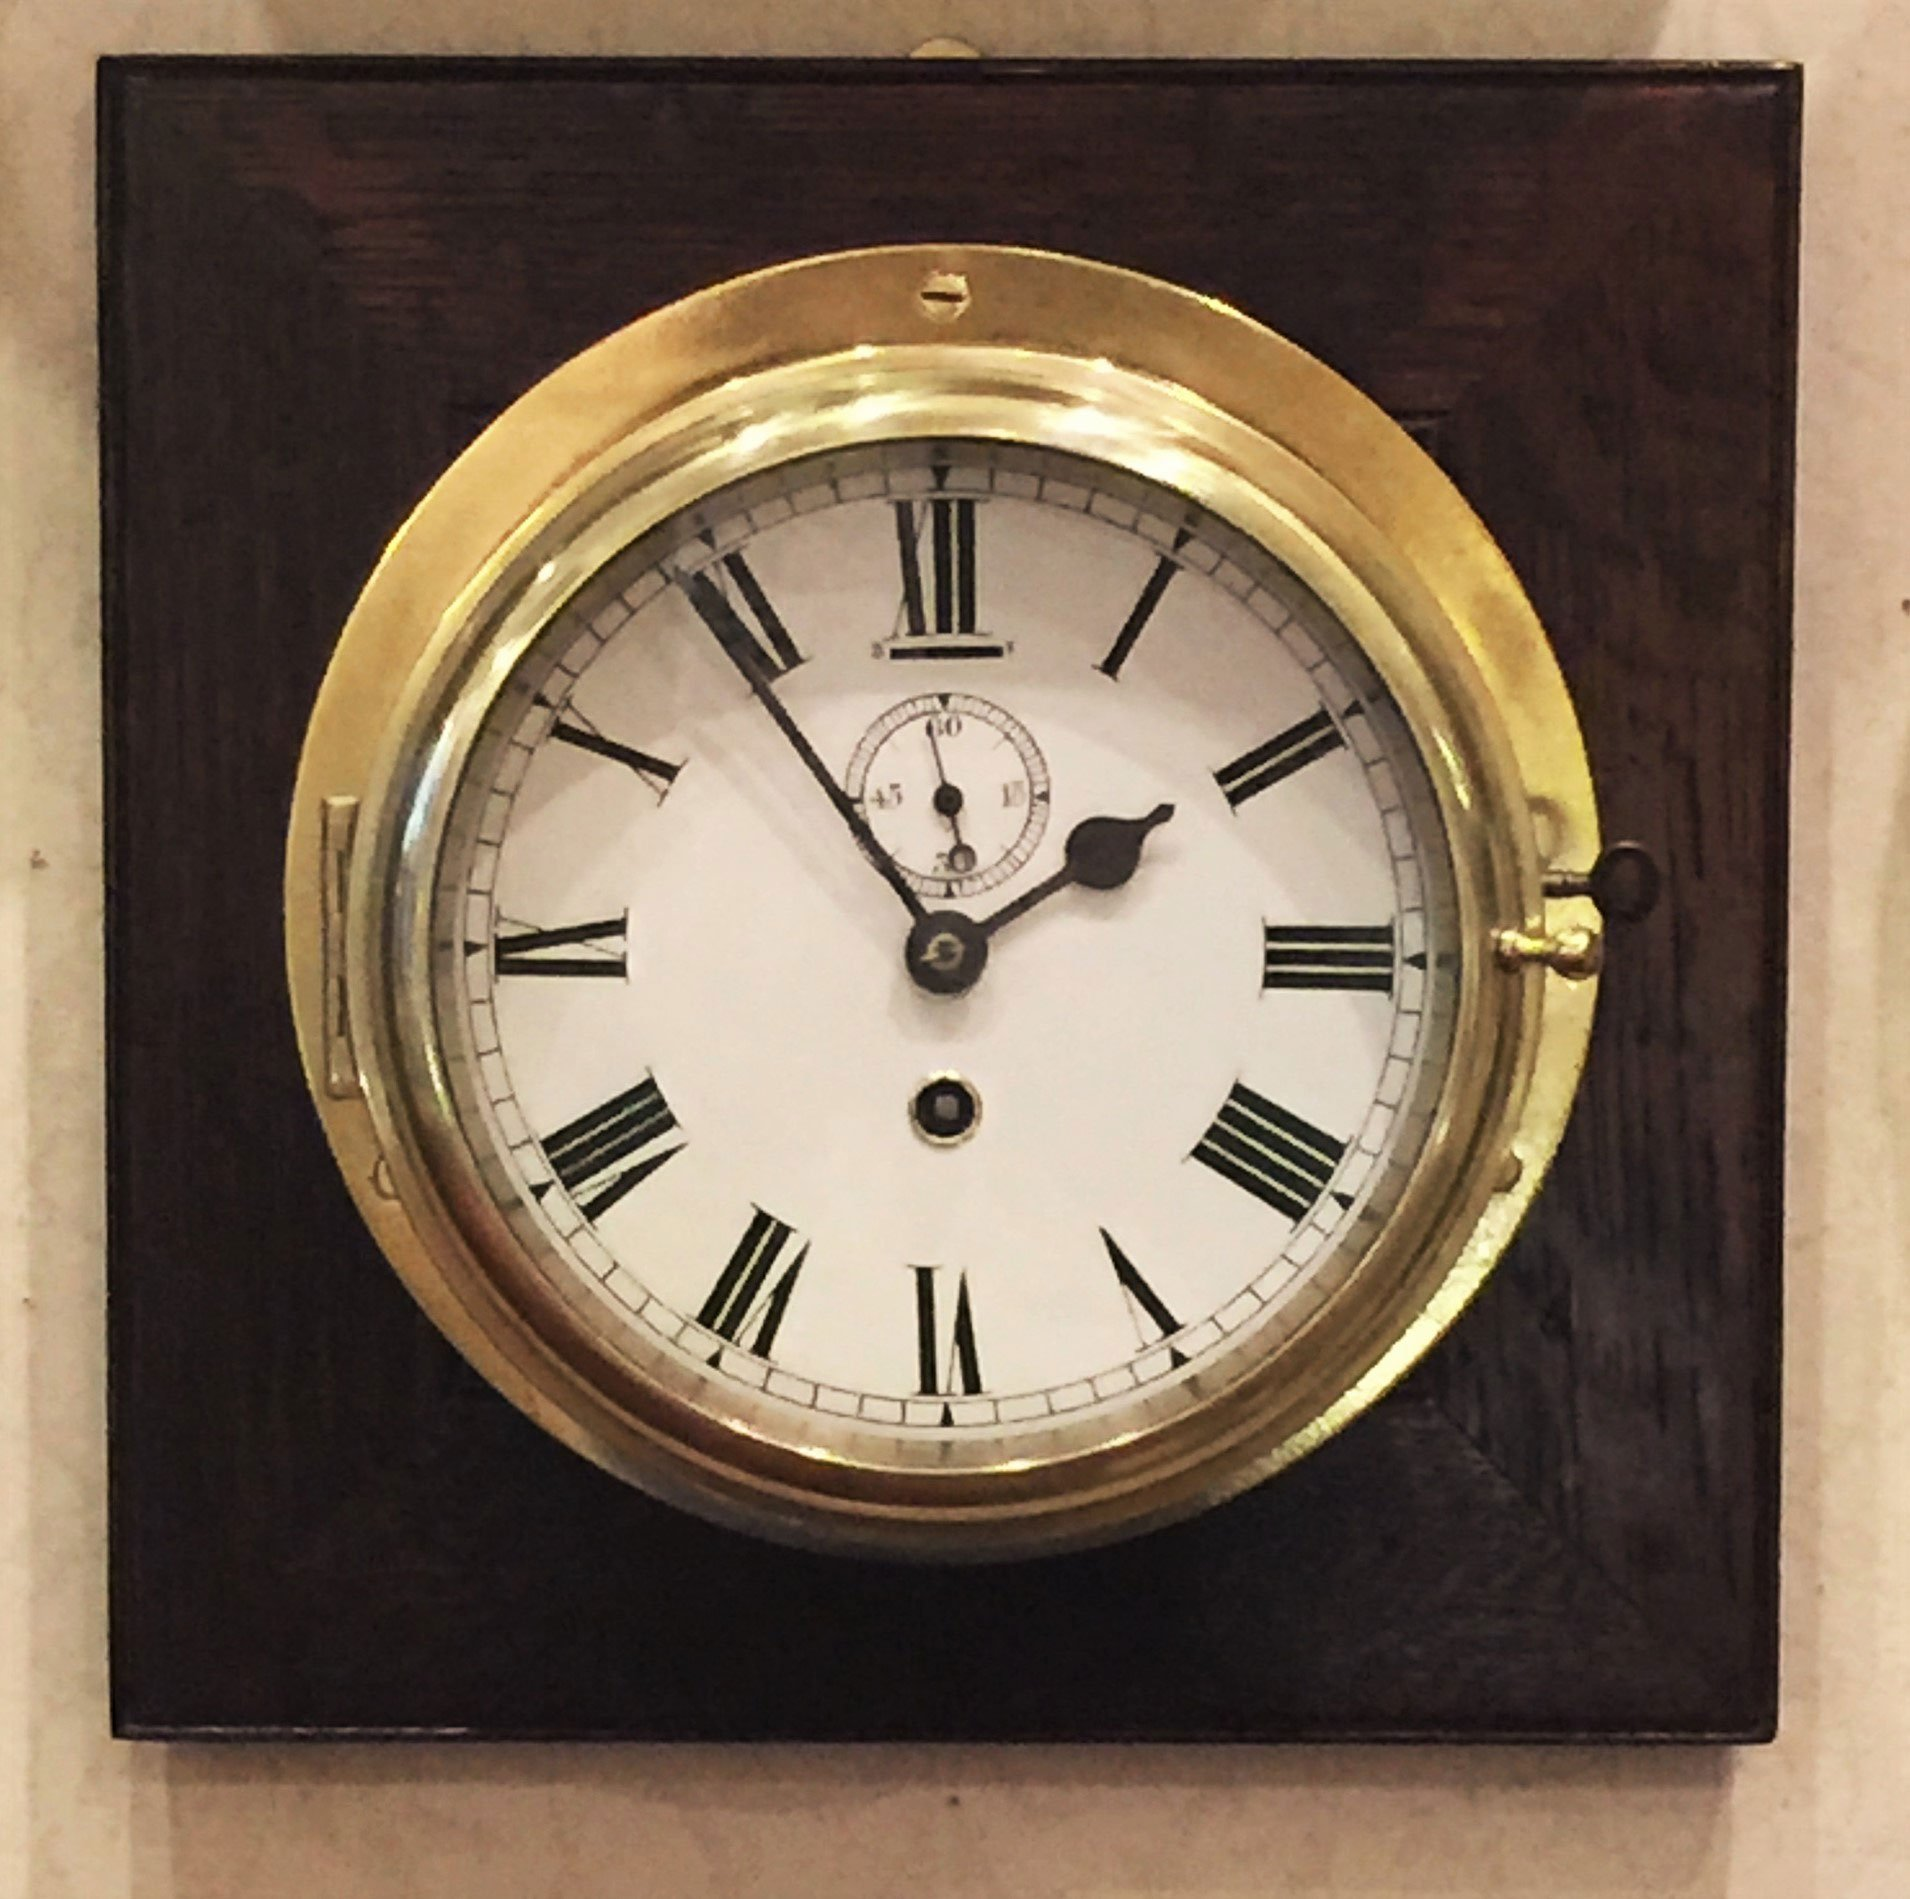 English fusee ships wall timepiece